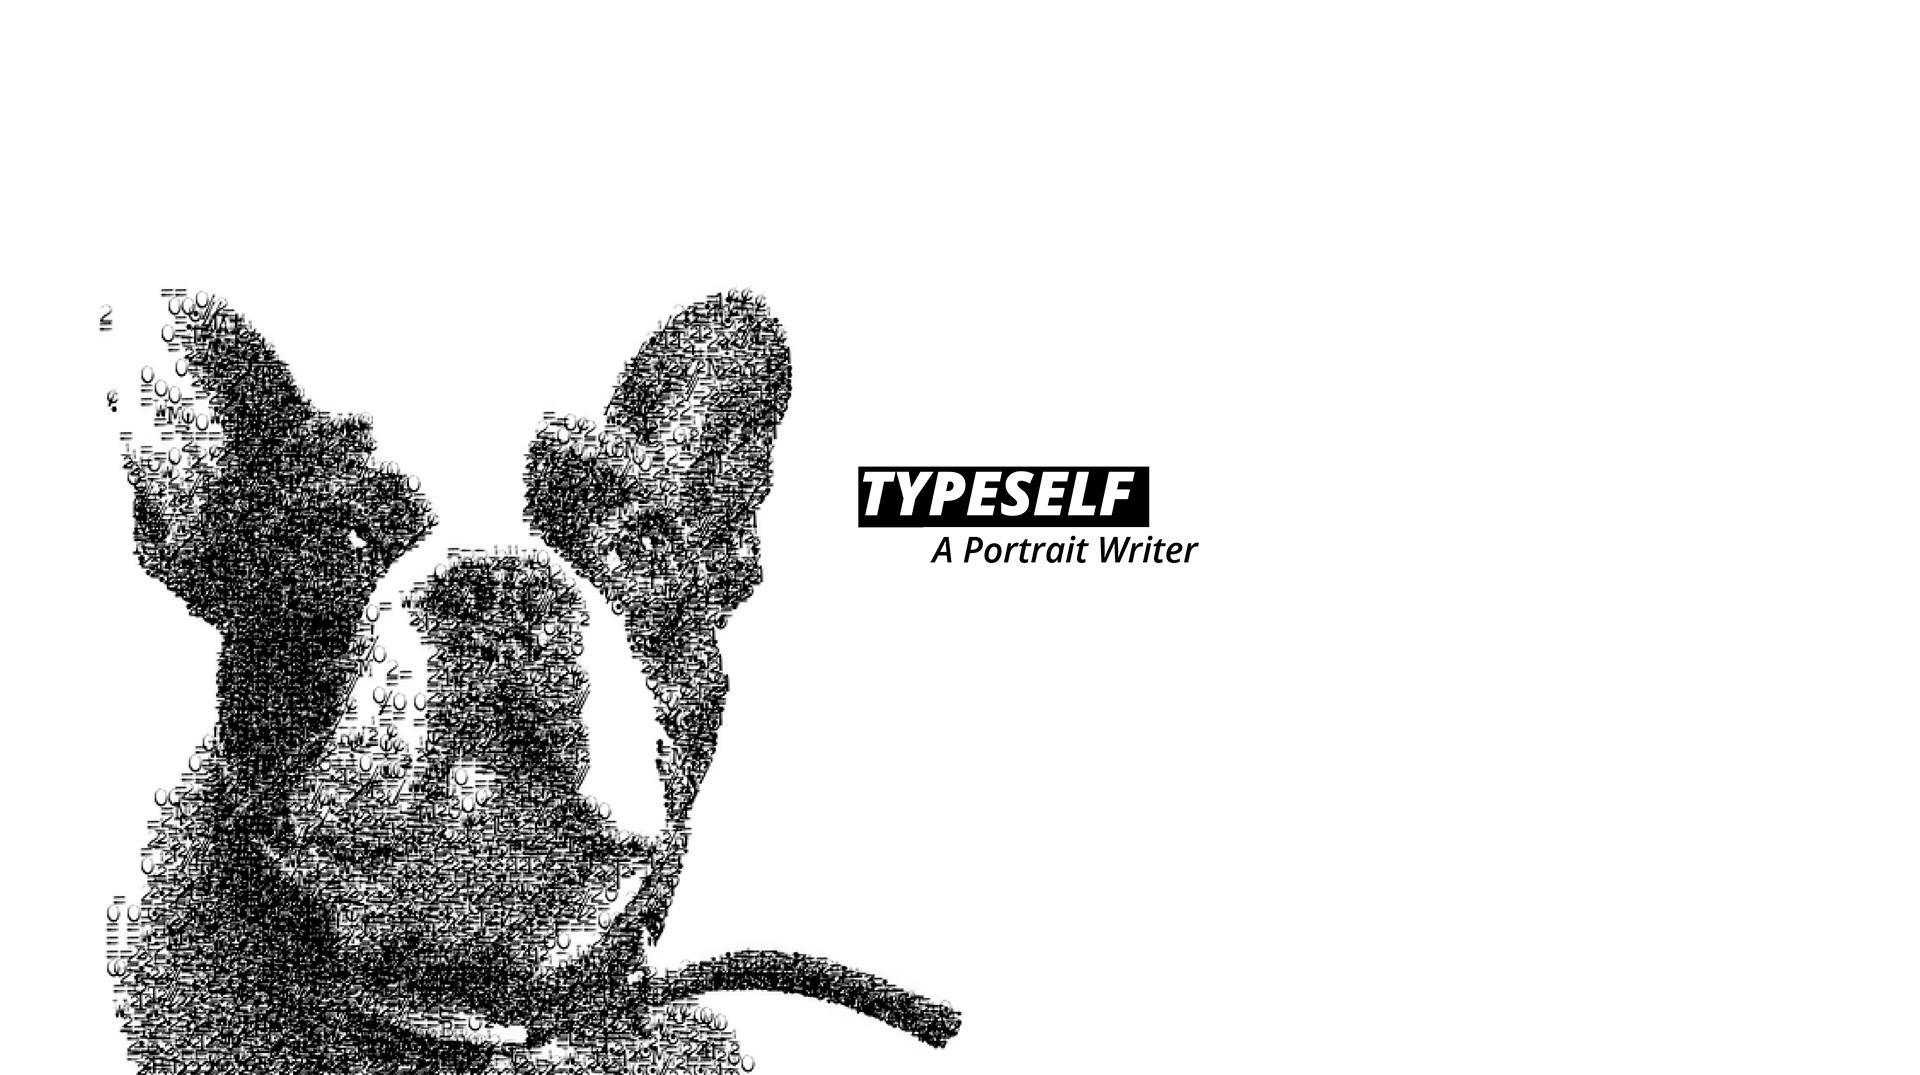 Typeself